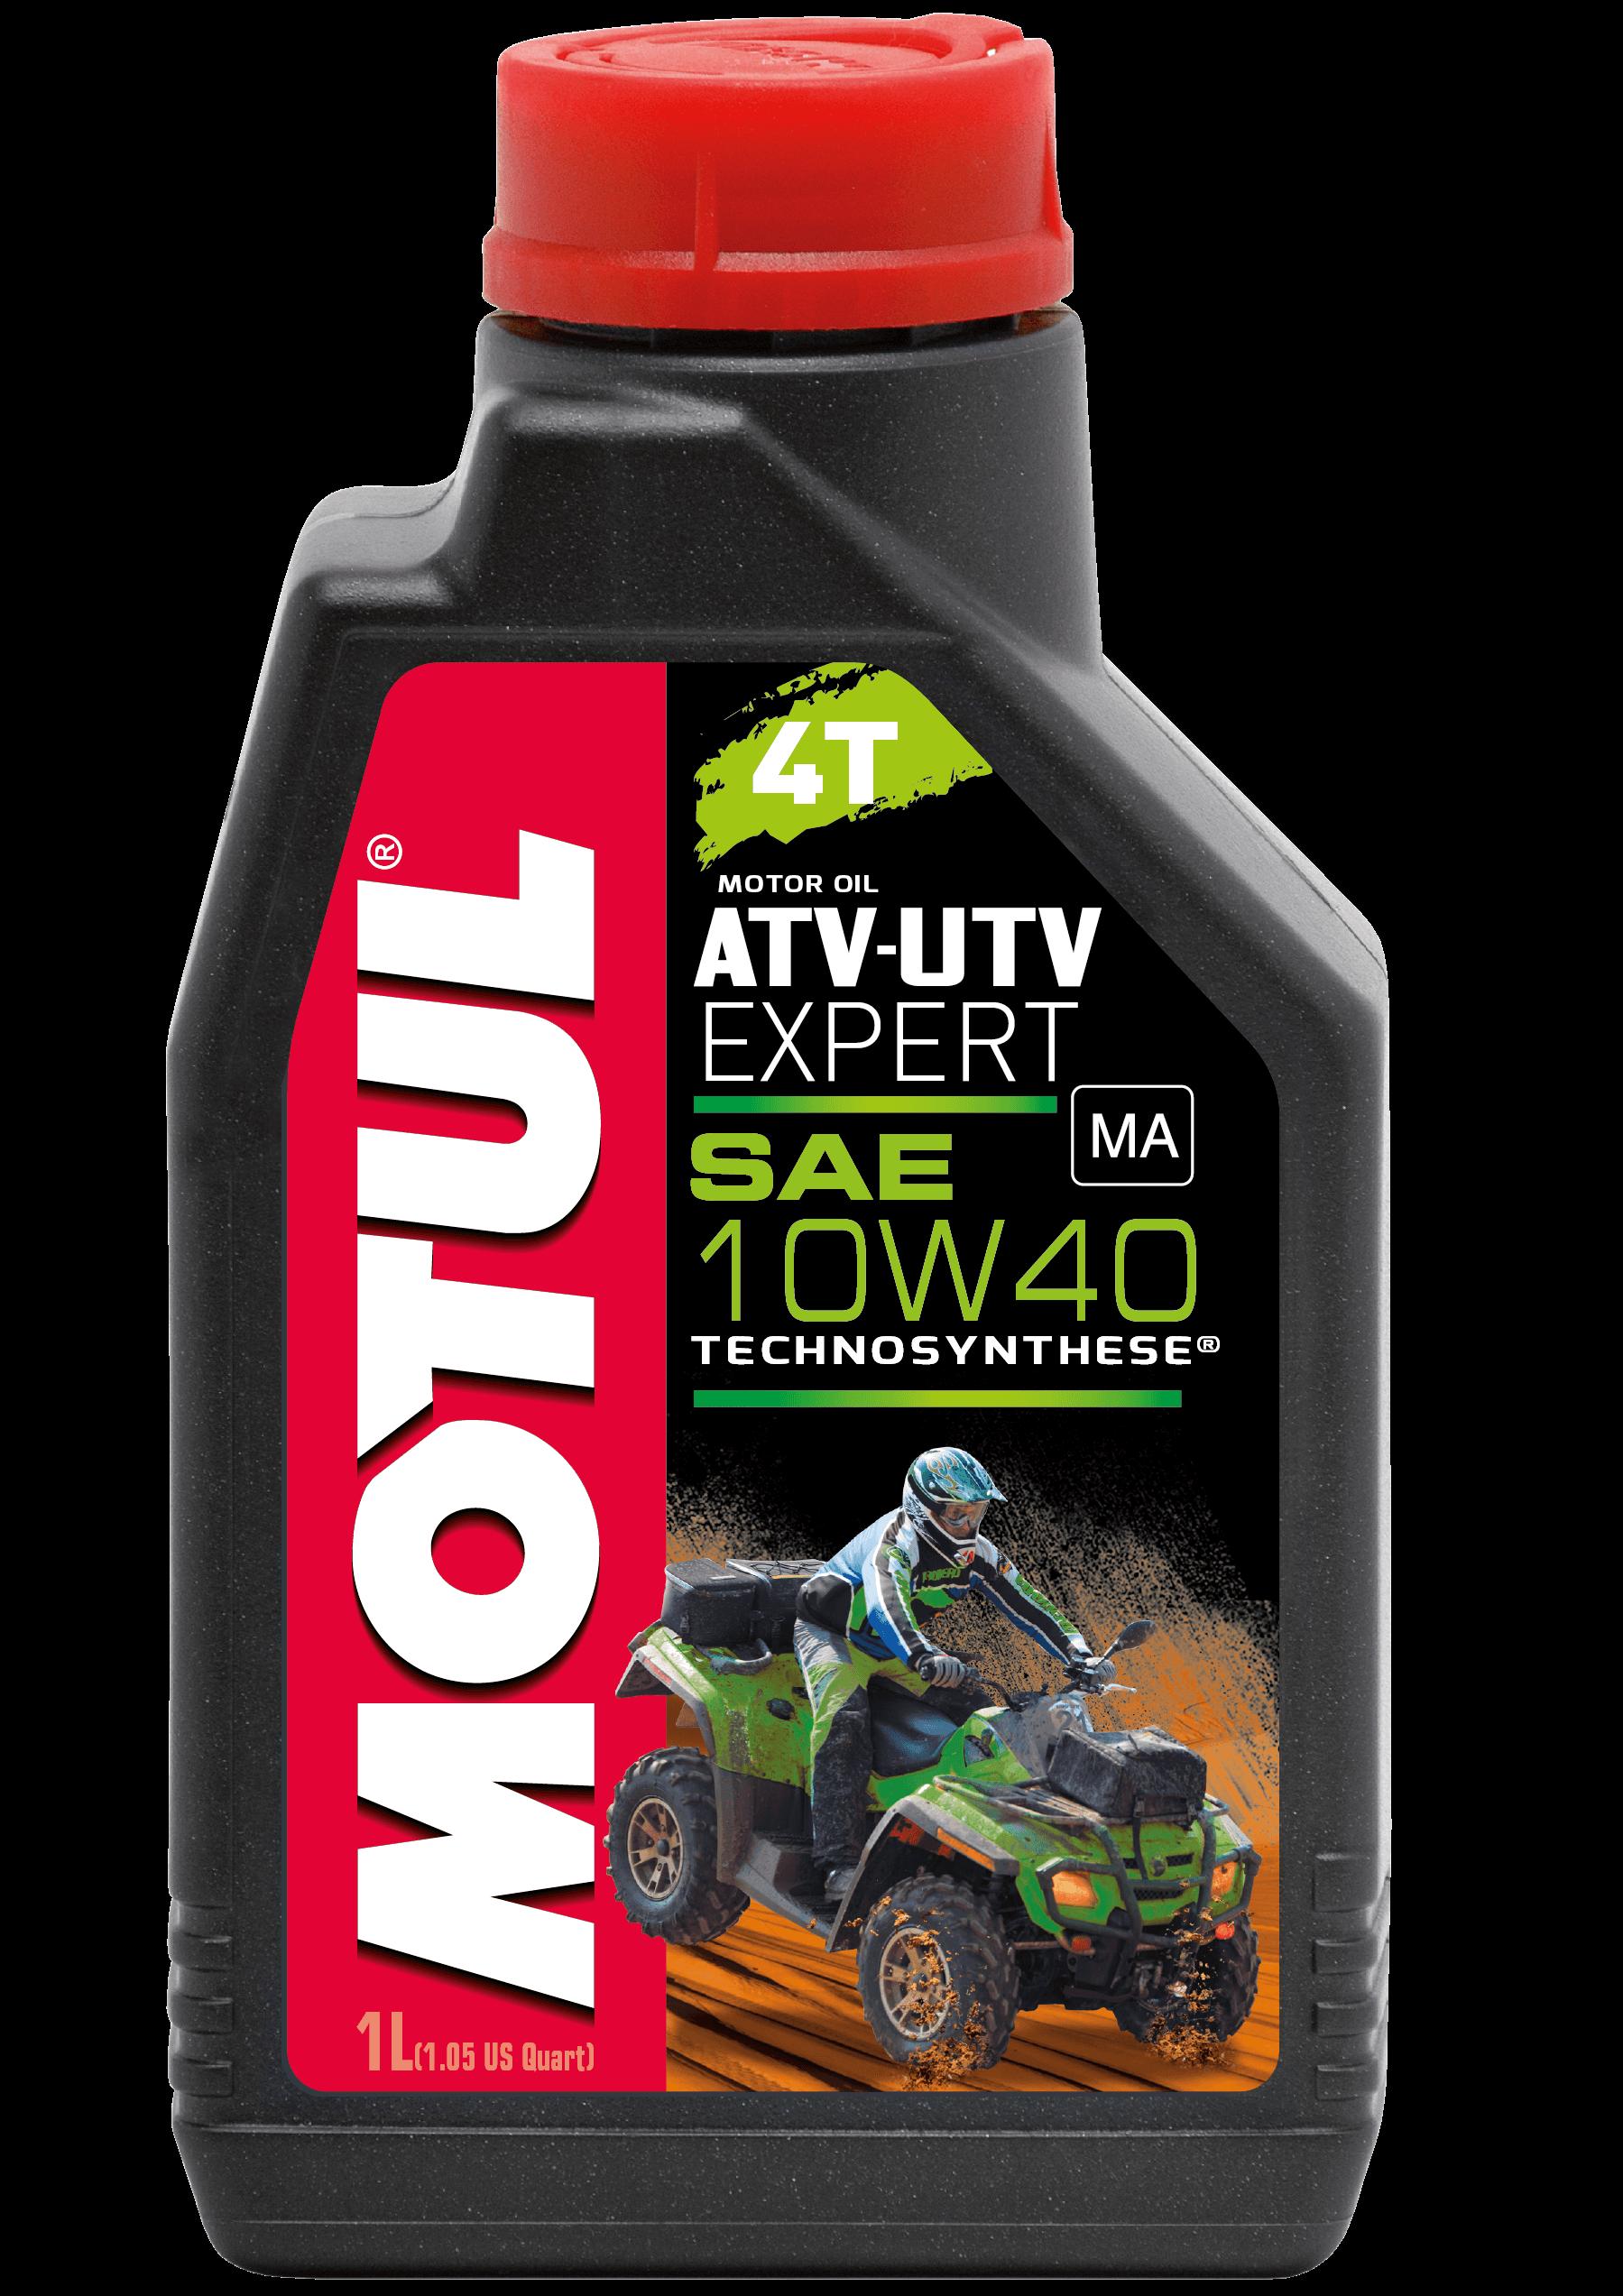 Moottoriöljy MOTUL ATV-UTV EXPERT 4T 10W40 1L